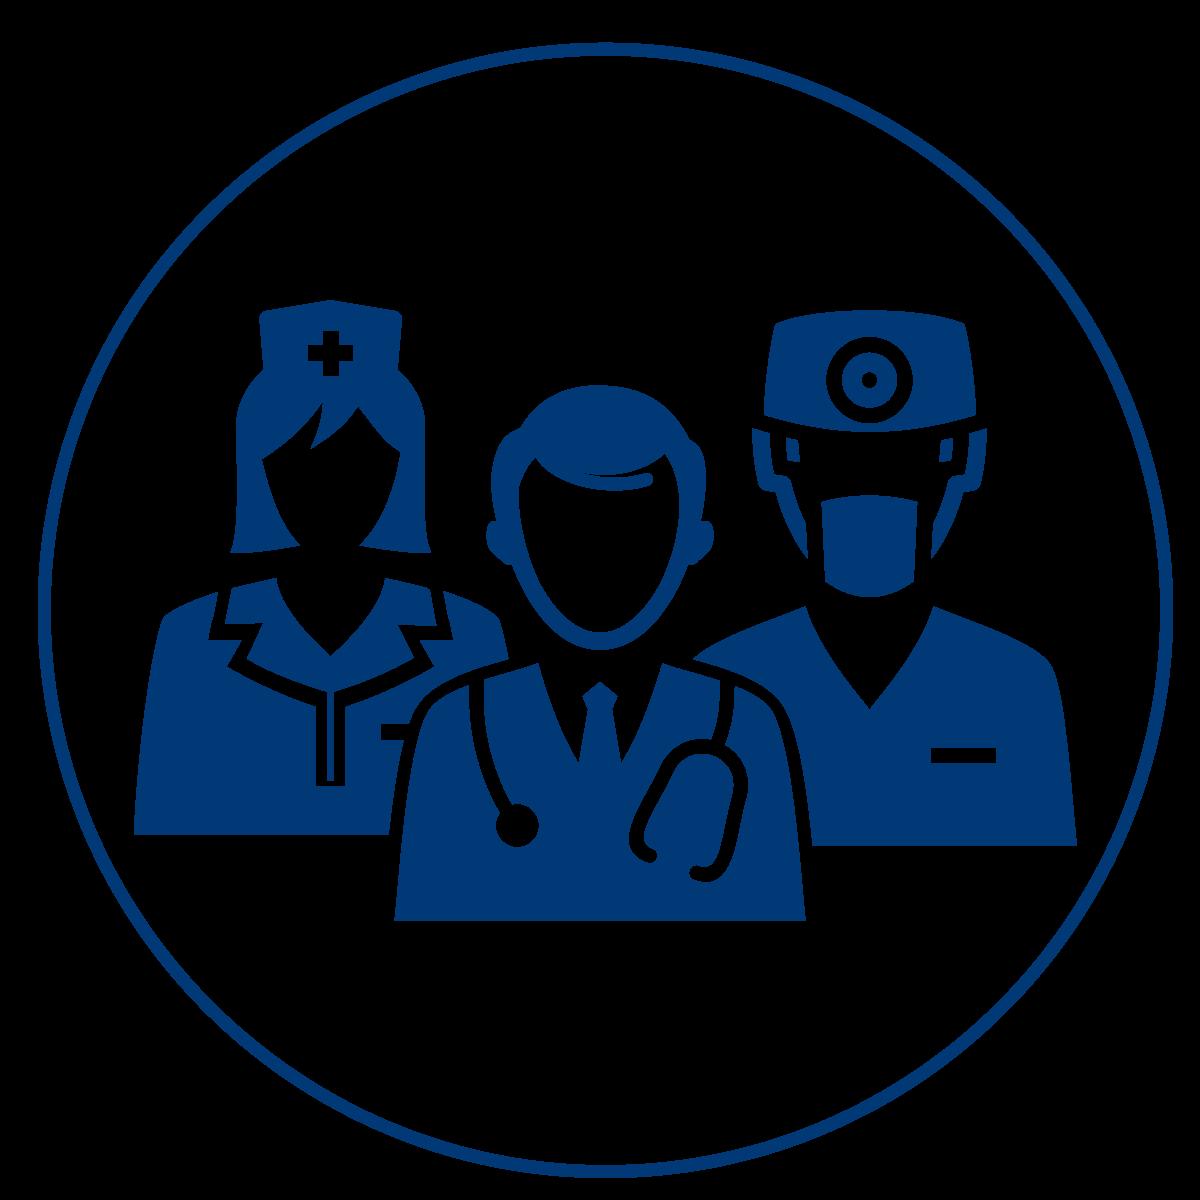 Emergency delhi ncr max. Professional clipart multidisciplinary team